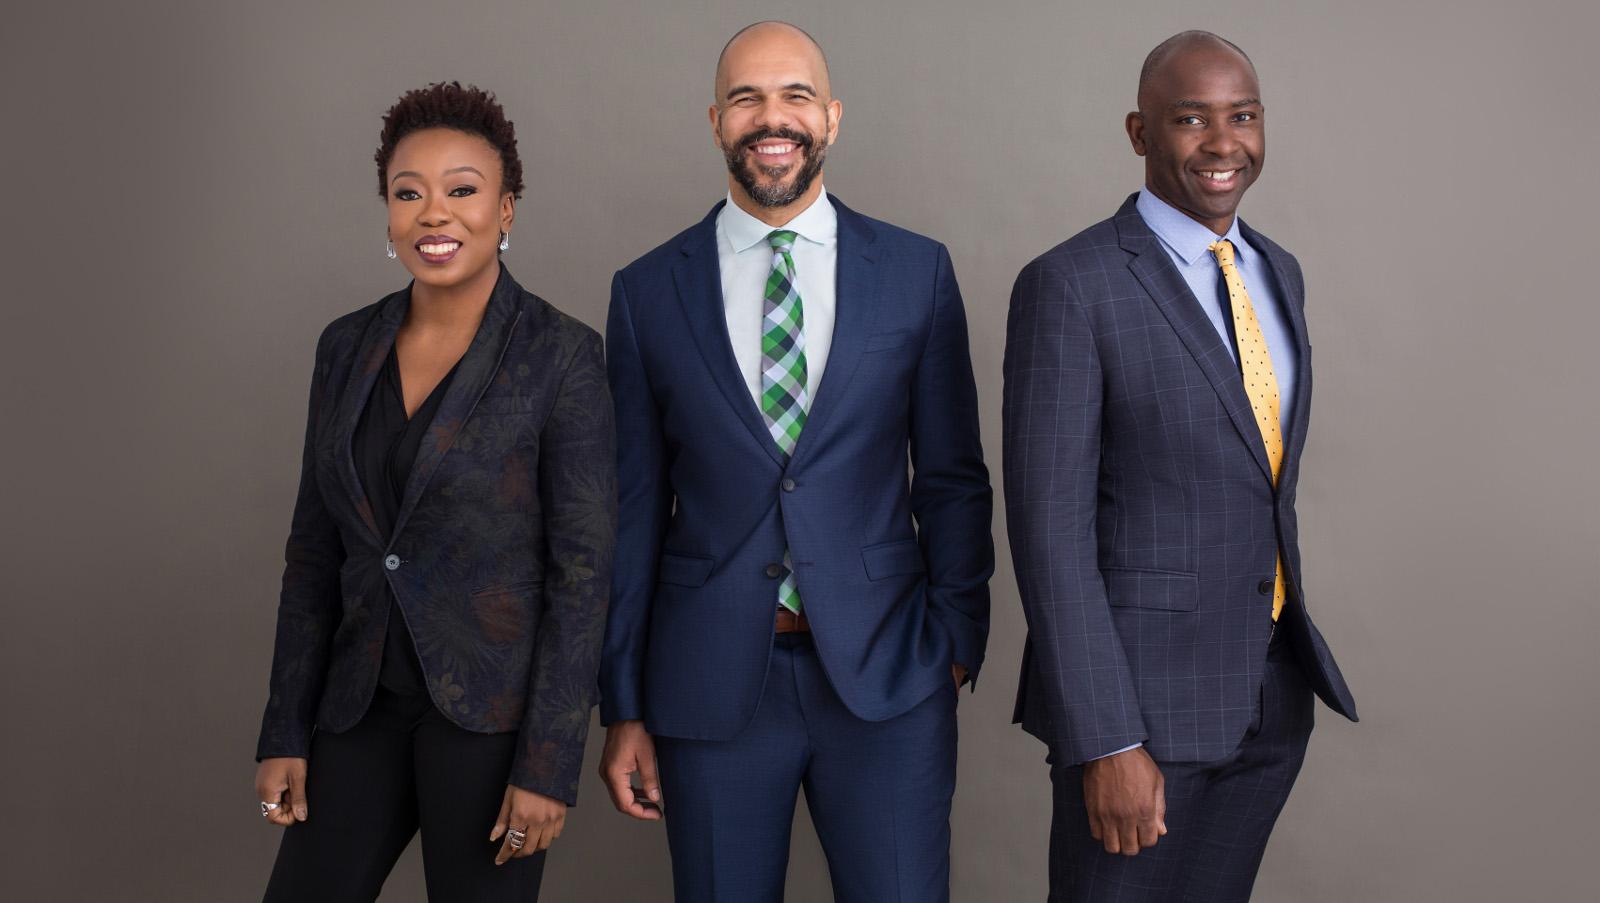 Featured image, left to right: Migo executive team Adia Sowho, Ekechi Nwokah, and Kunle Olukotun (Supplied)